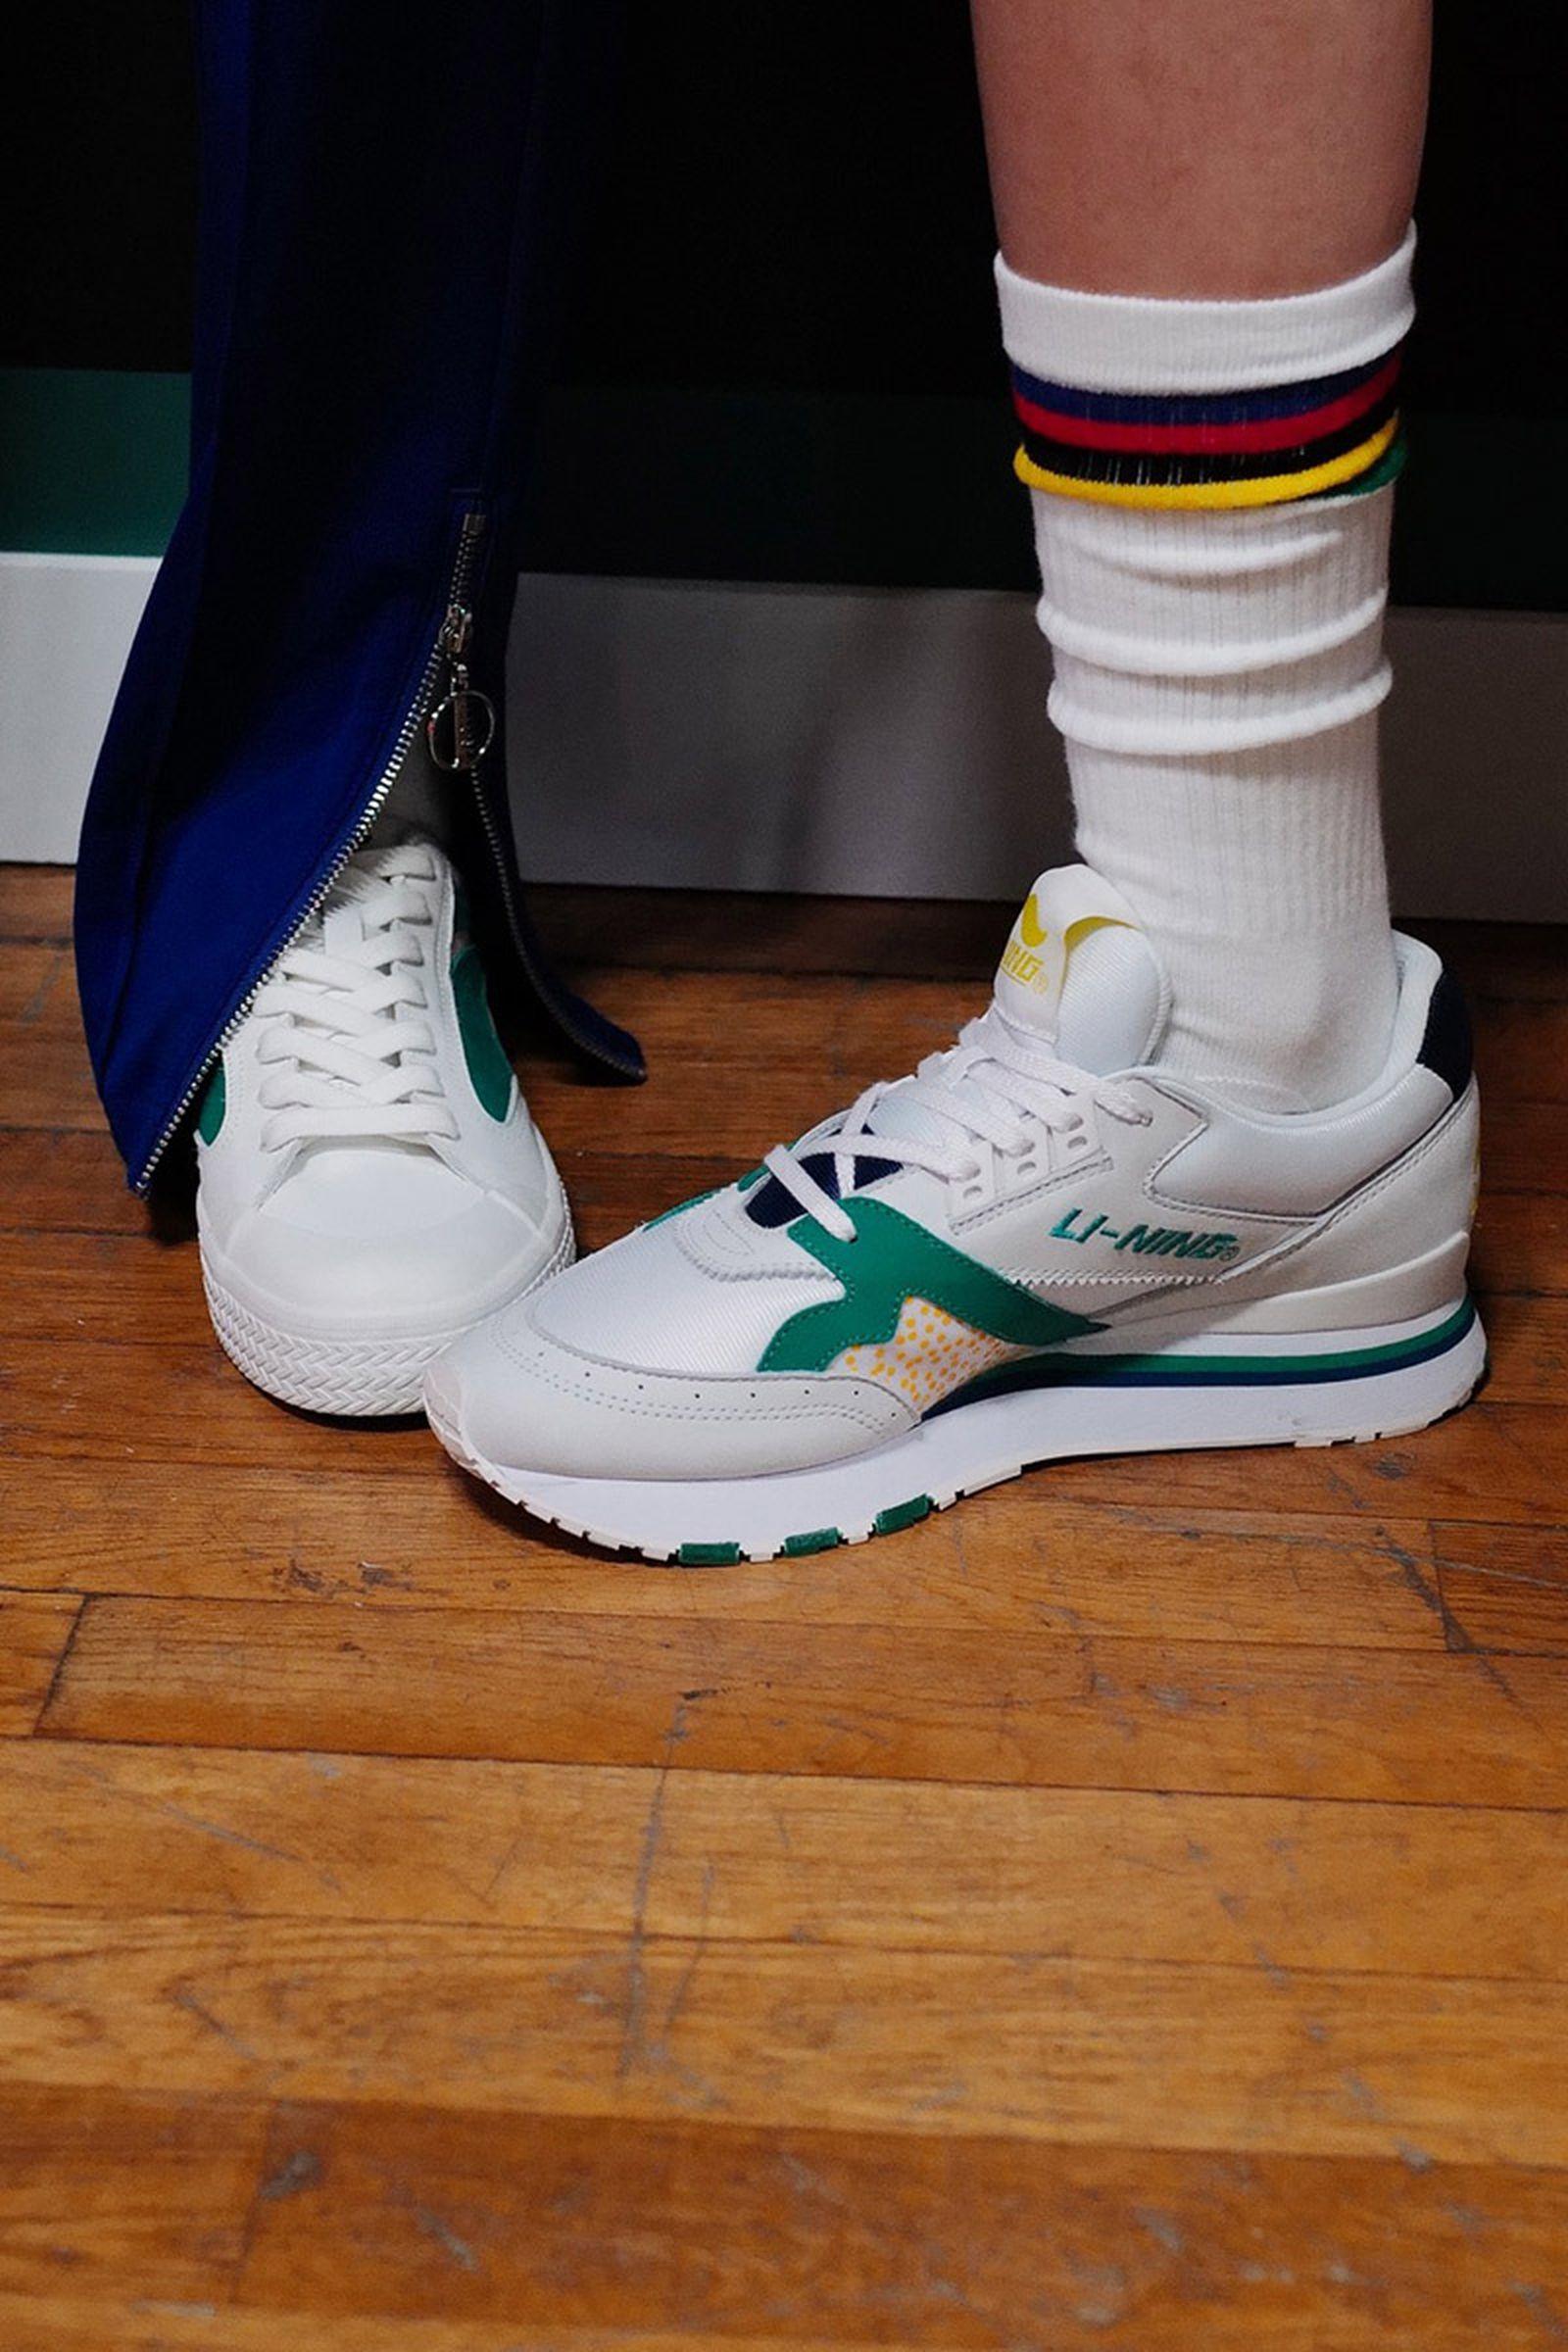 li ning ss20 sneakers IMG 1708 Louis Vuitton Nike OAMC